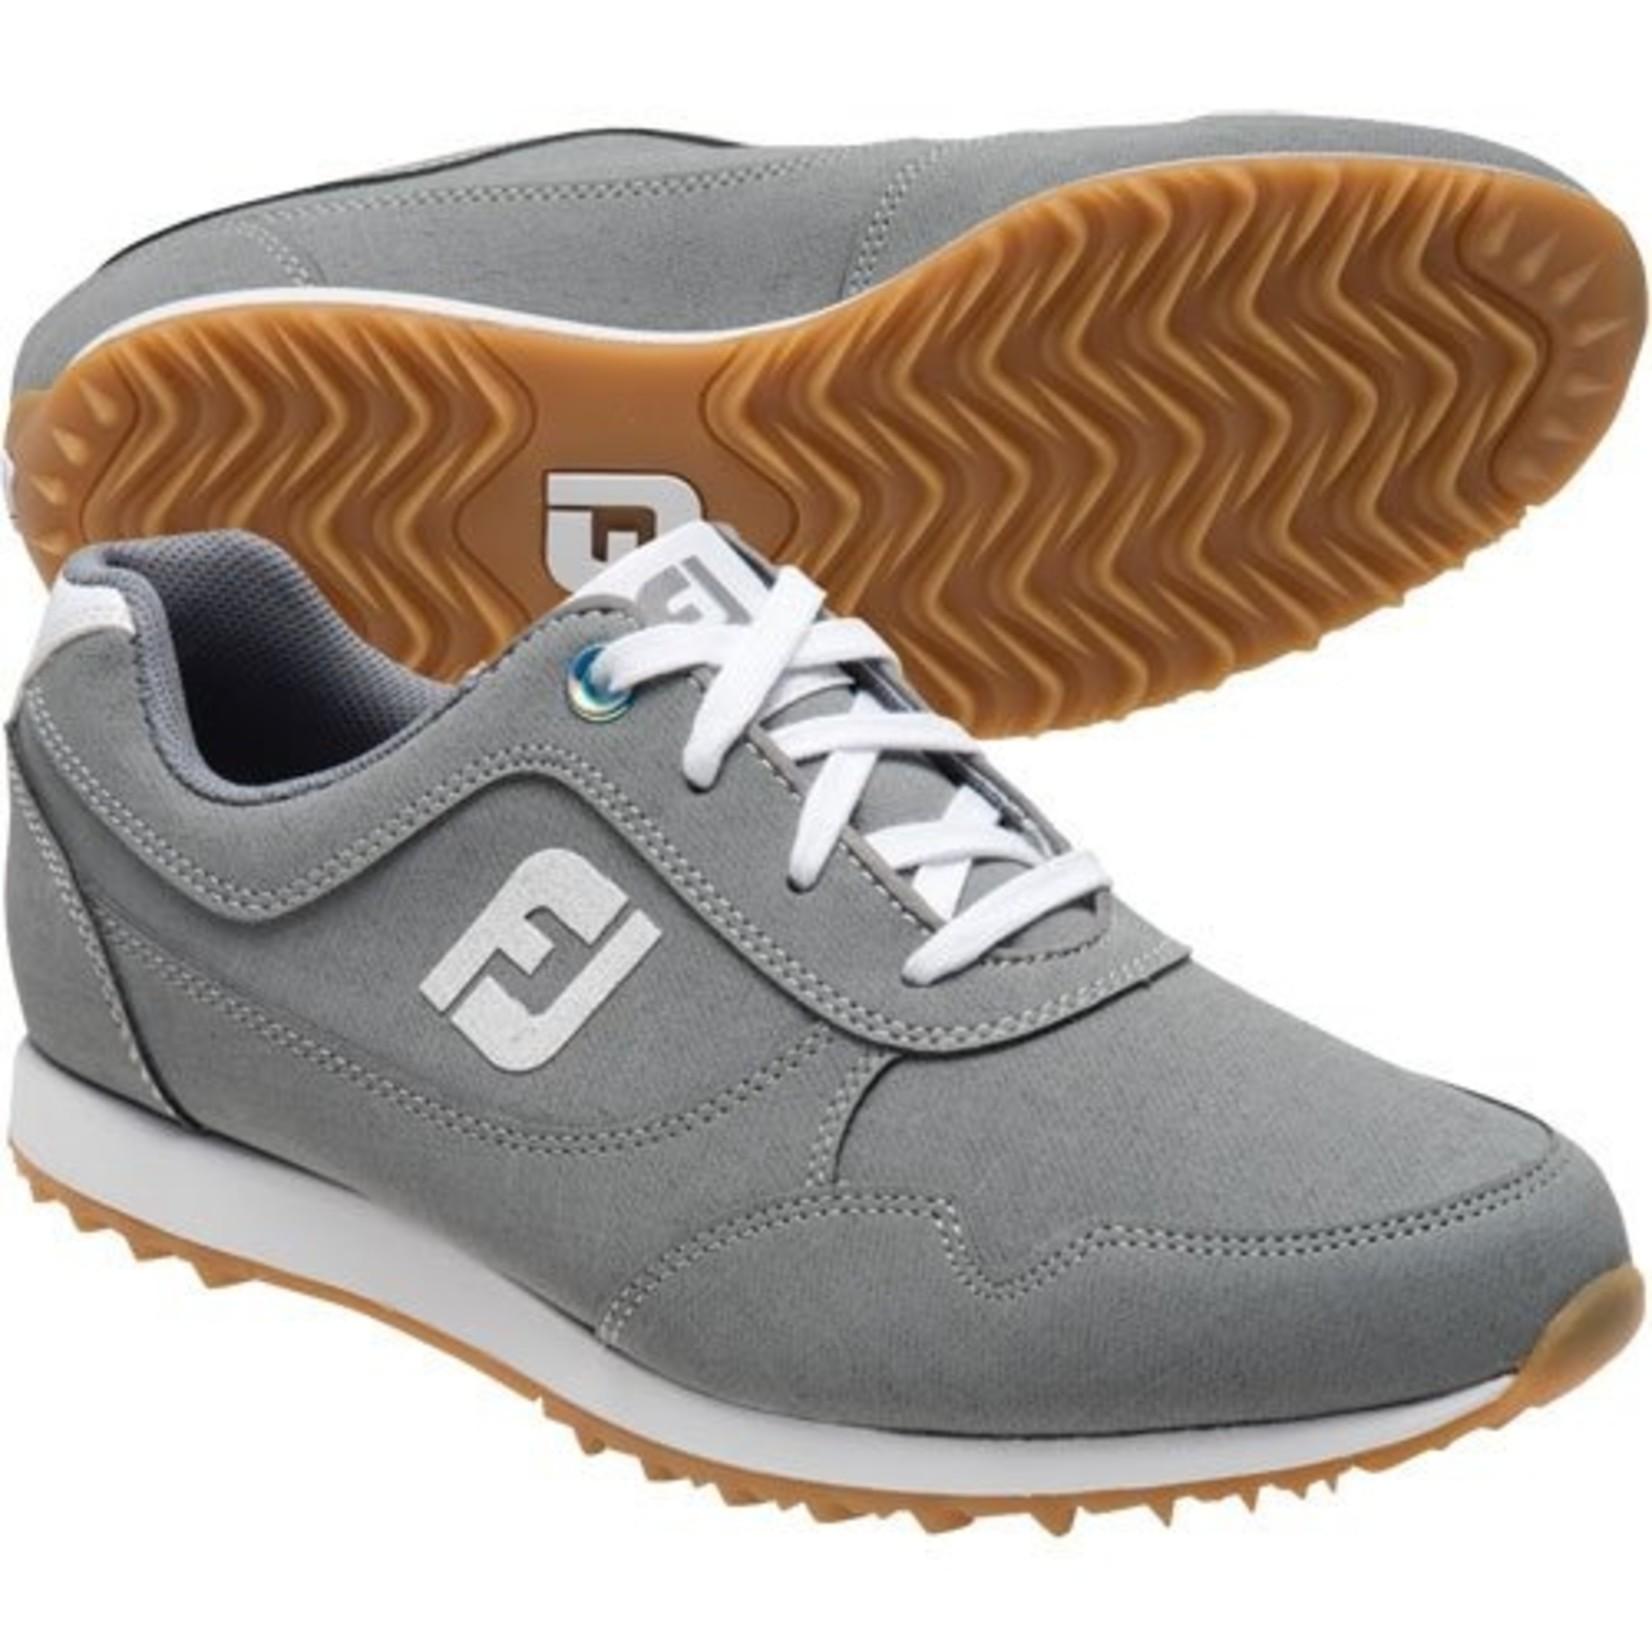 Footjoy FJ Wmns Retro Spkless Sneaker